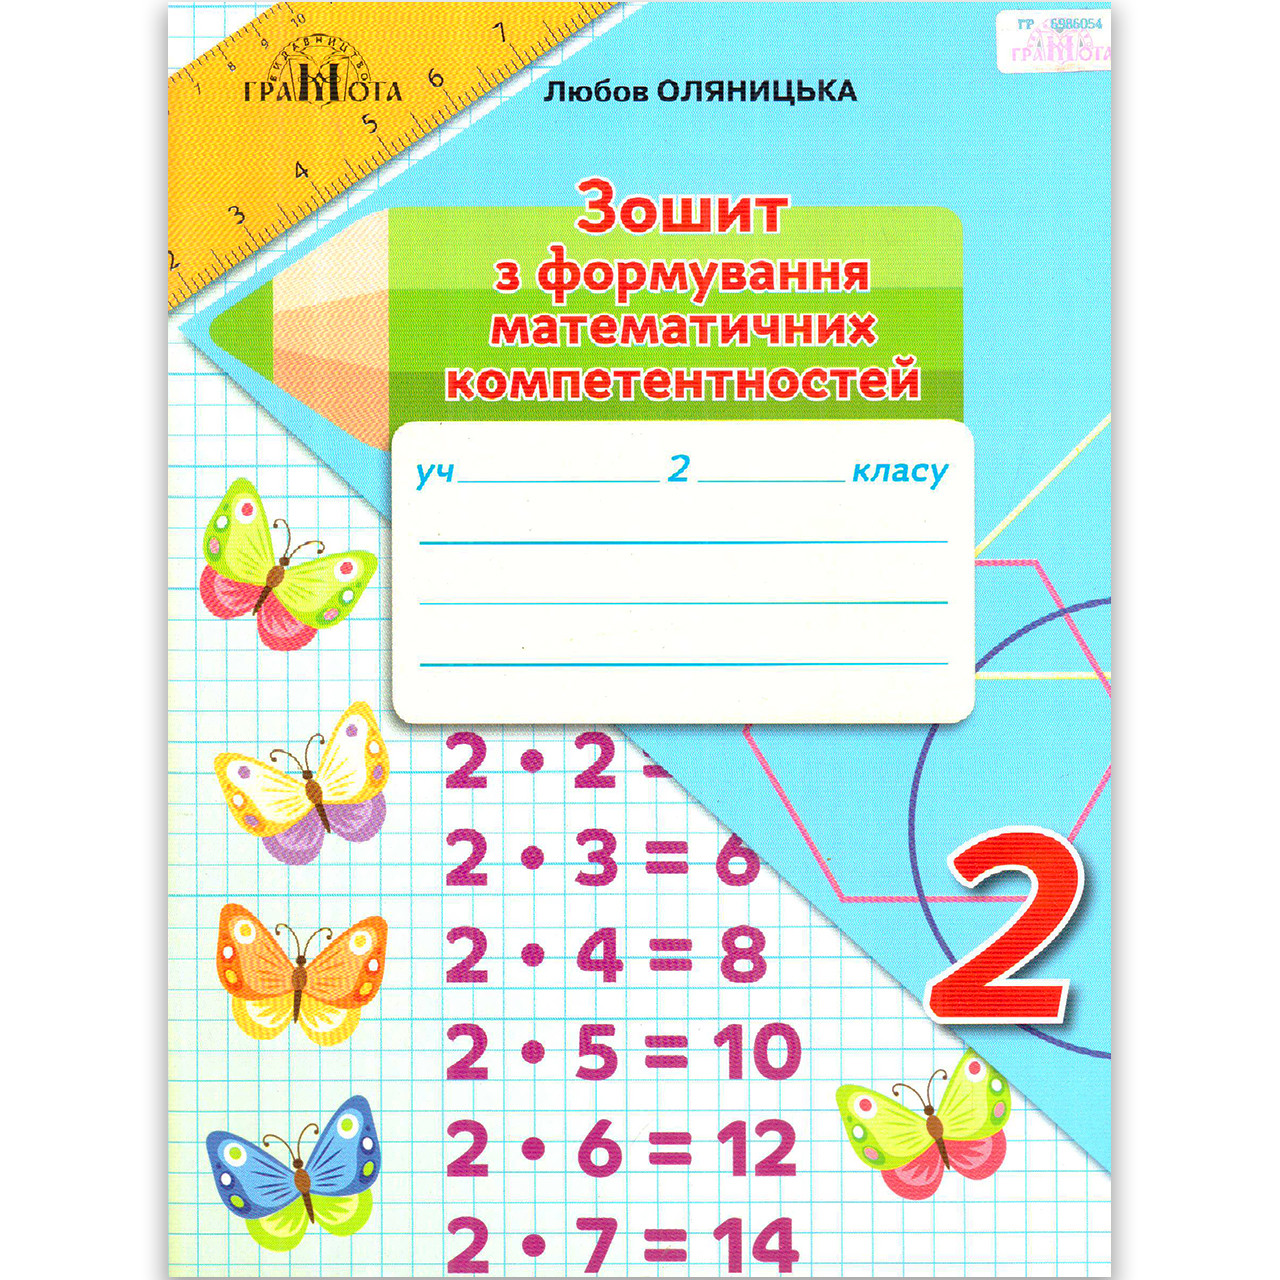 Зошит з формування математичних компетентностей 2 клас Авт: Оляницька Л. Вид: Грамота